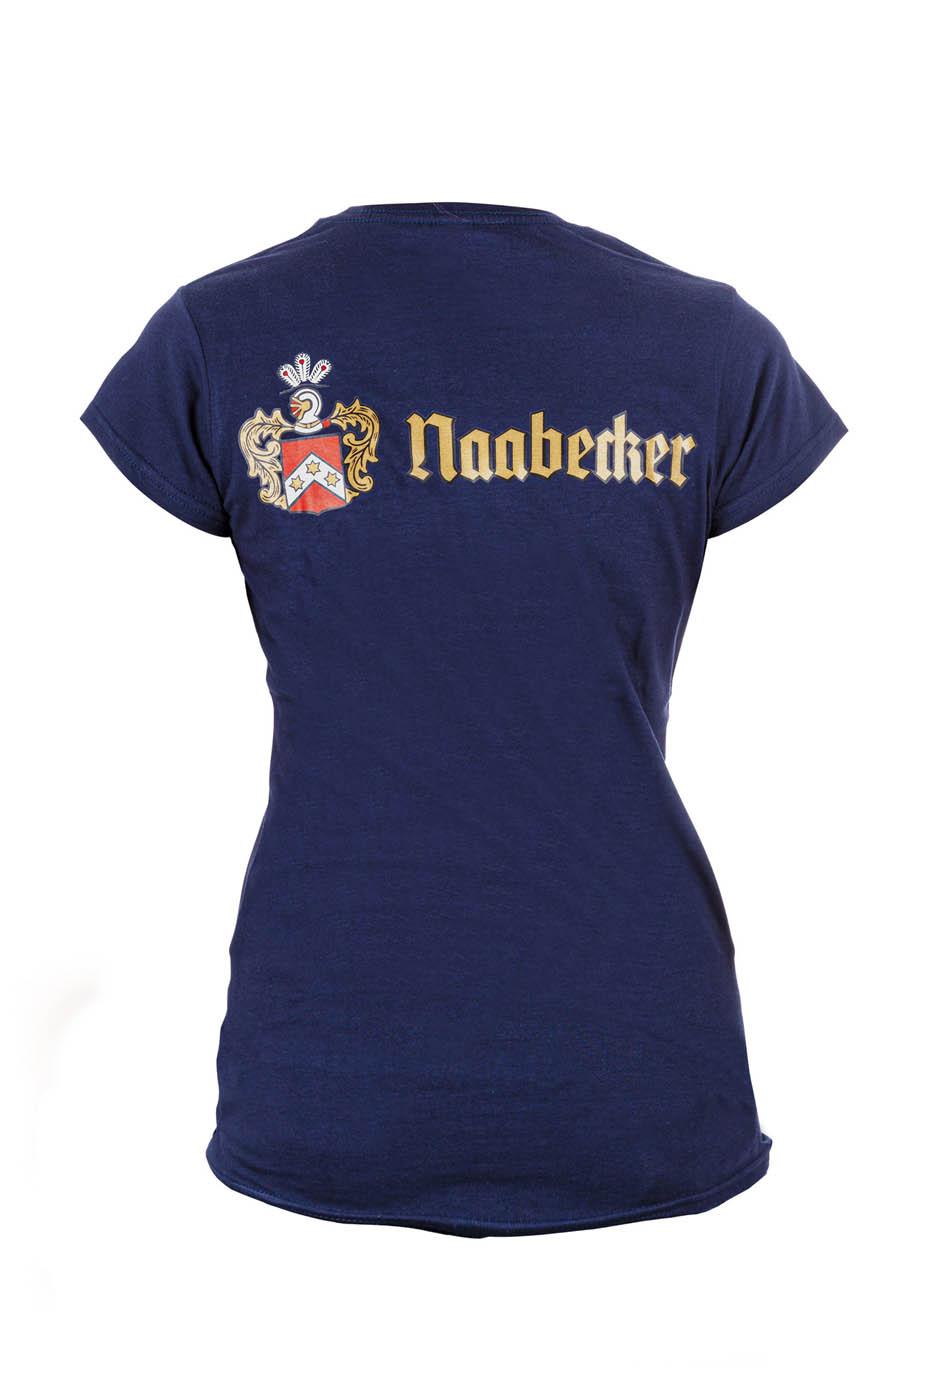 Naabecker  T-Shirt Ladies